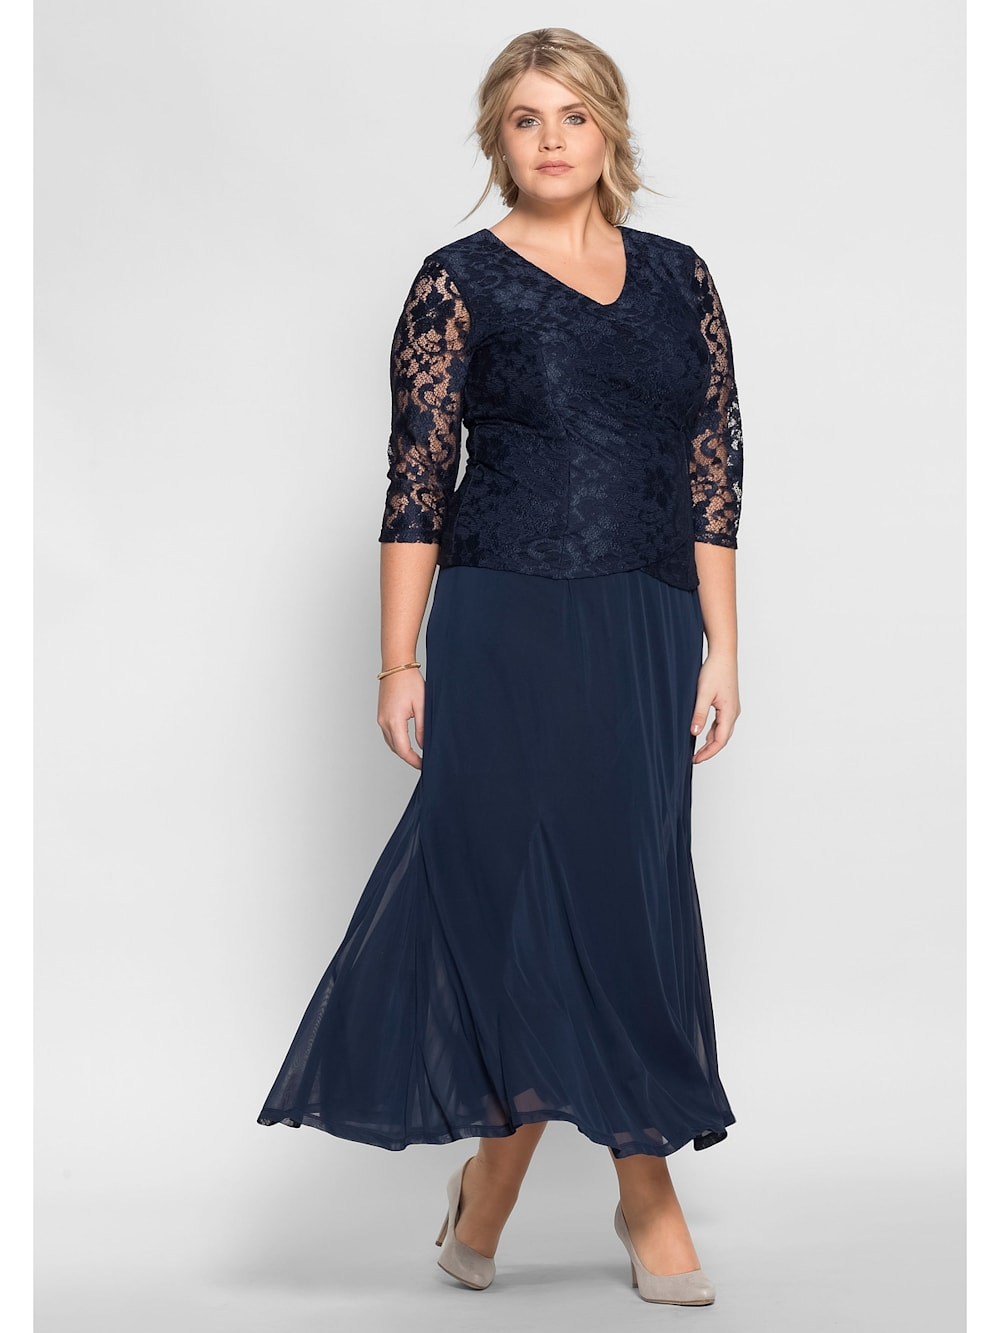 Sheego Sheego Abendkleid mit floraler Spitze  Klingel